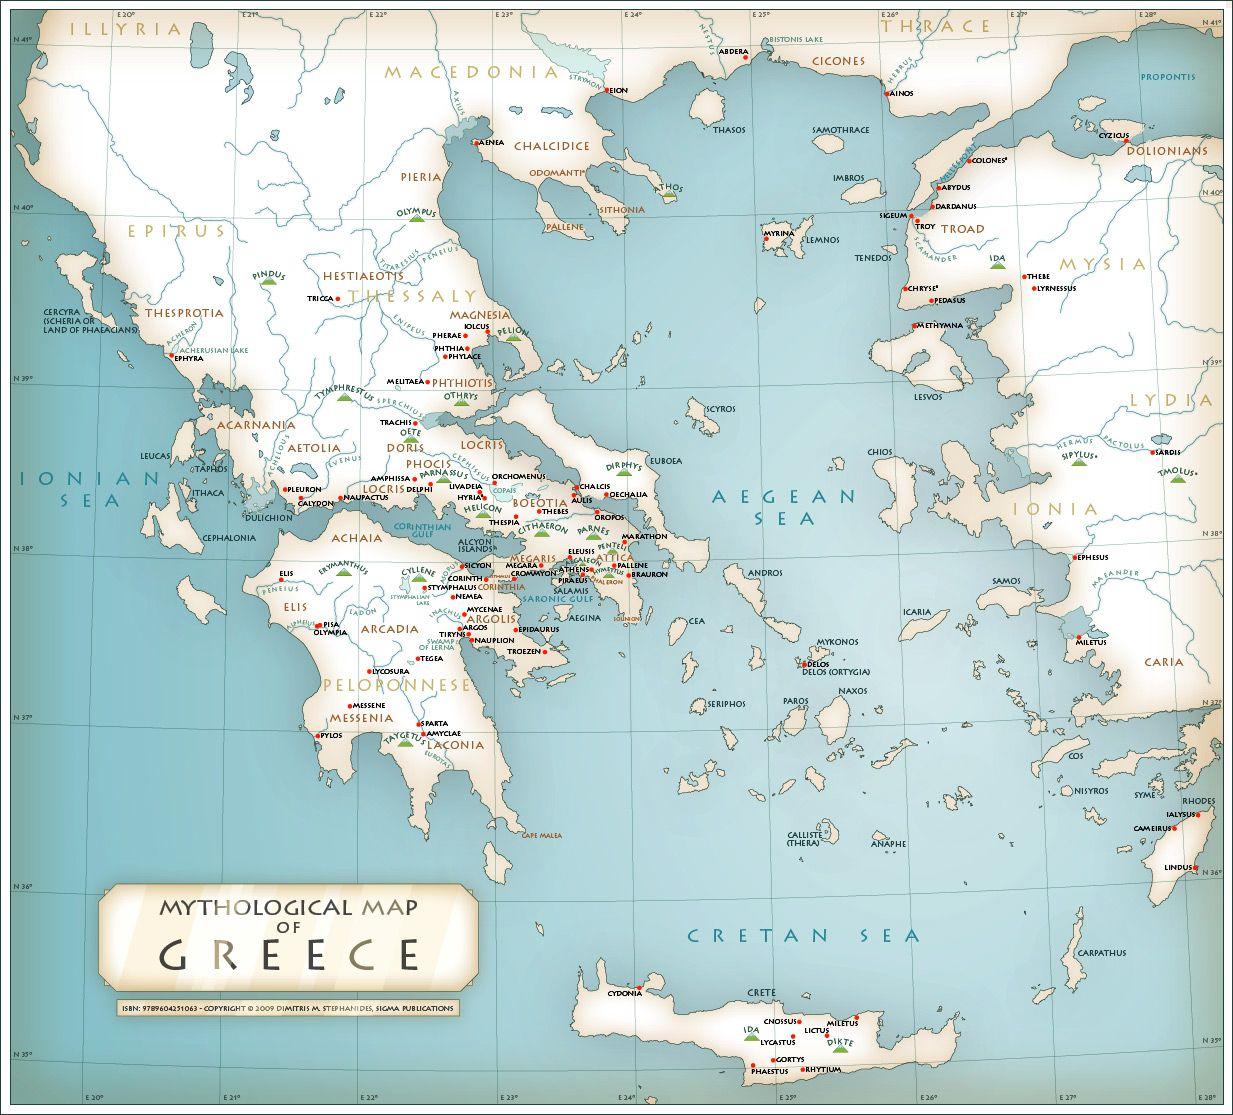 Mapgreecebignamesg 12331115 historical maps pinterest mapgreecebignamesg 12331115 gumiabroncs Images